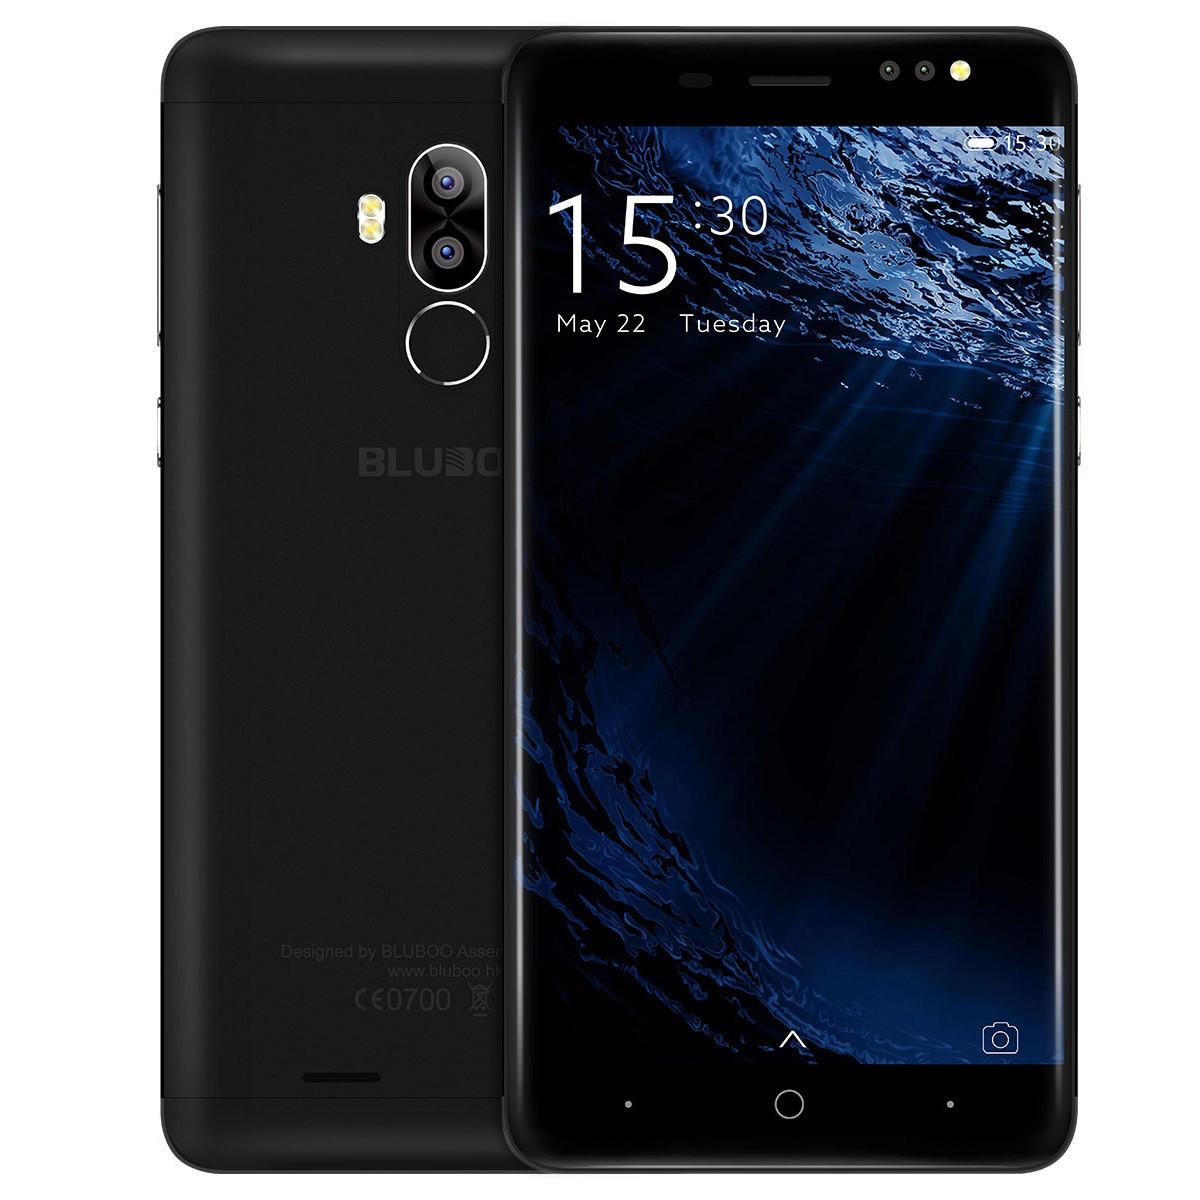 "Smartphone Bluboo D1 - 5.0"" And. 7.0 MTK6580 Quad 1.3GHz 16GB 5/8+2MP"